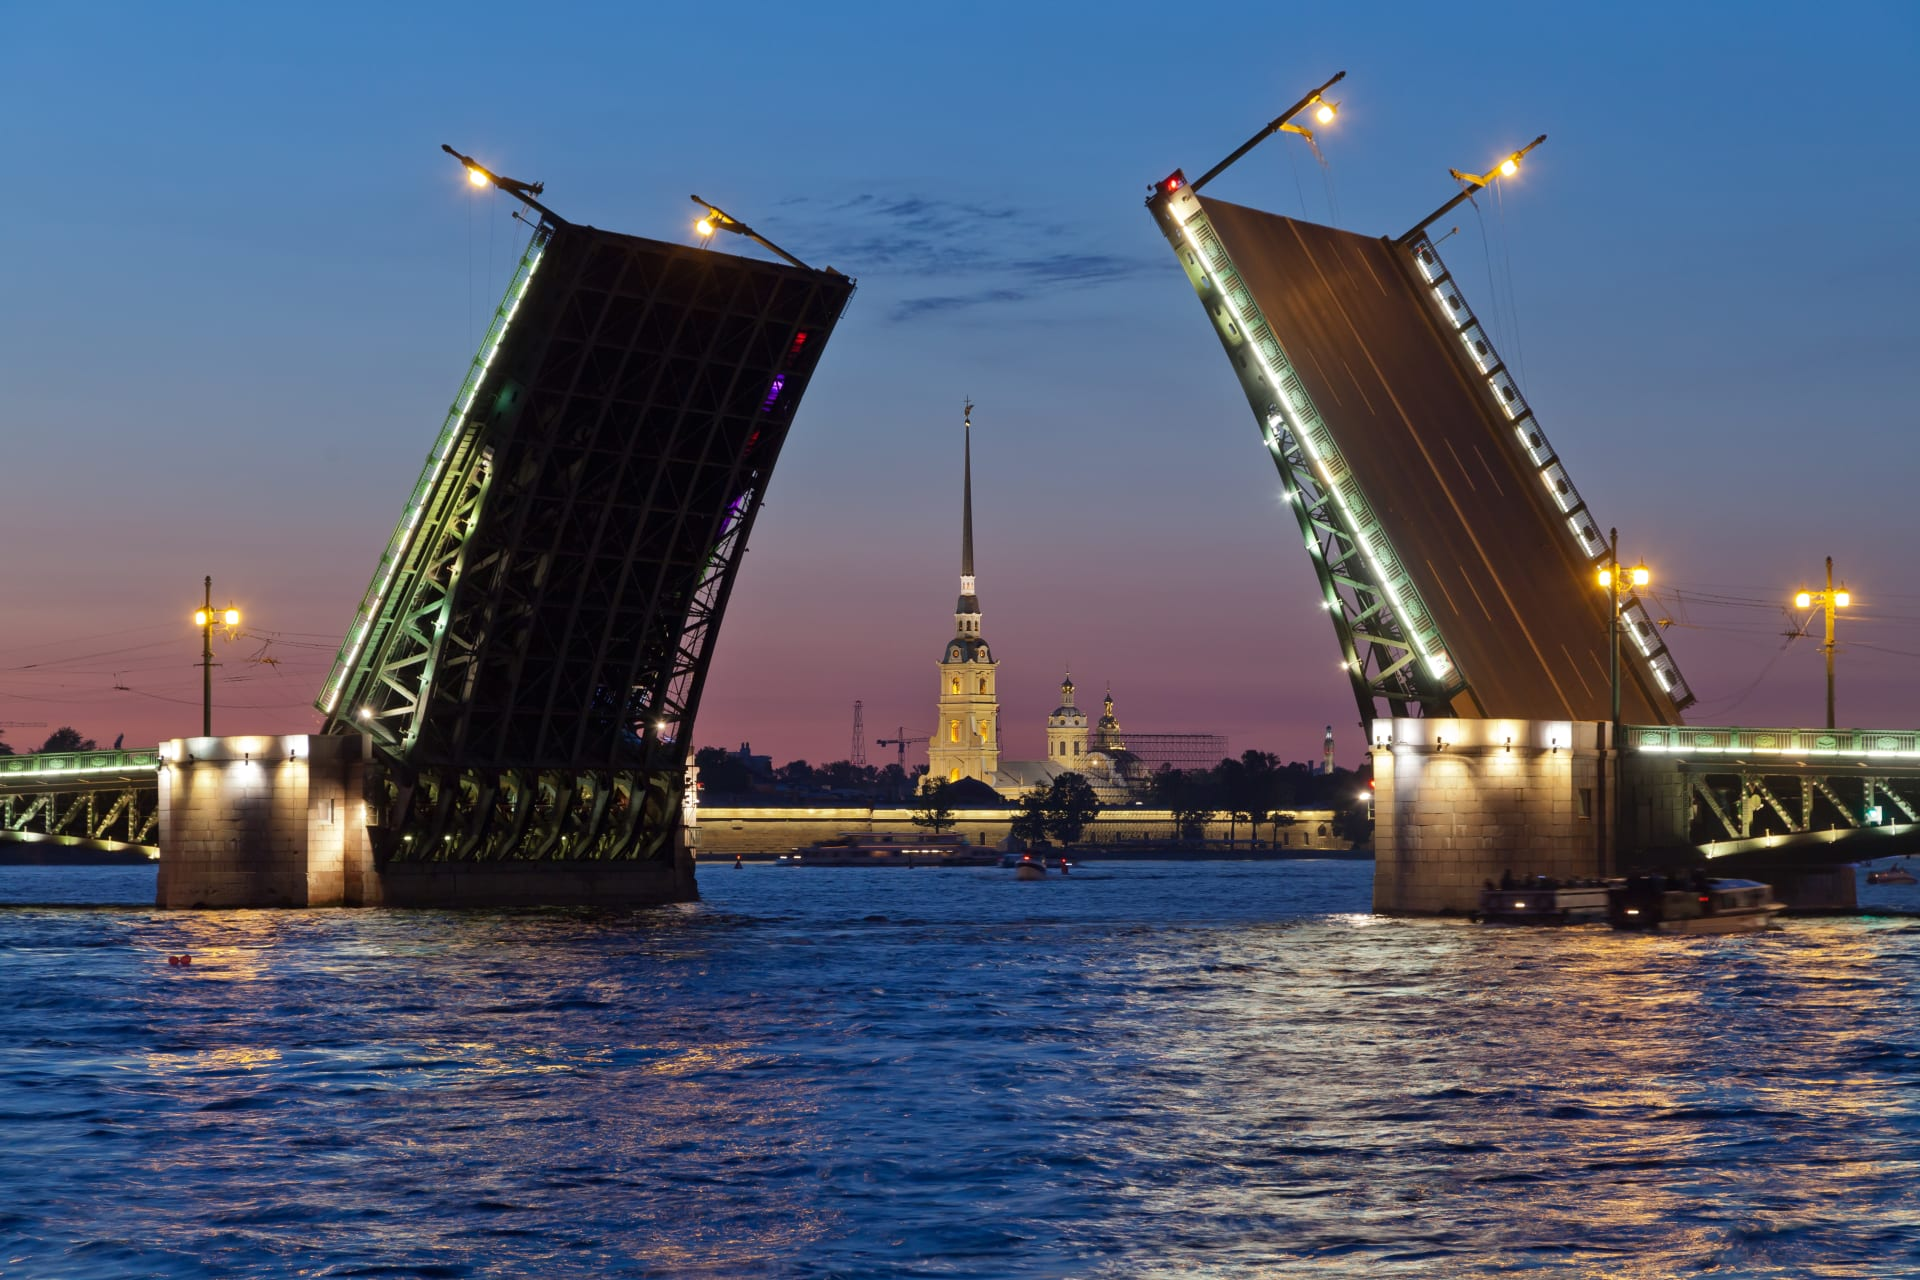 Saint Petersburg - White Nights Special: Boat Trip